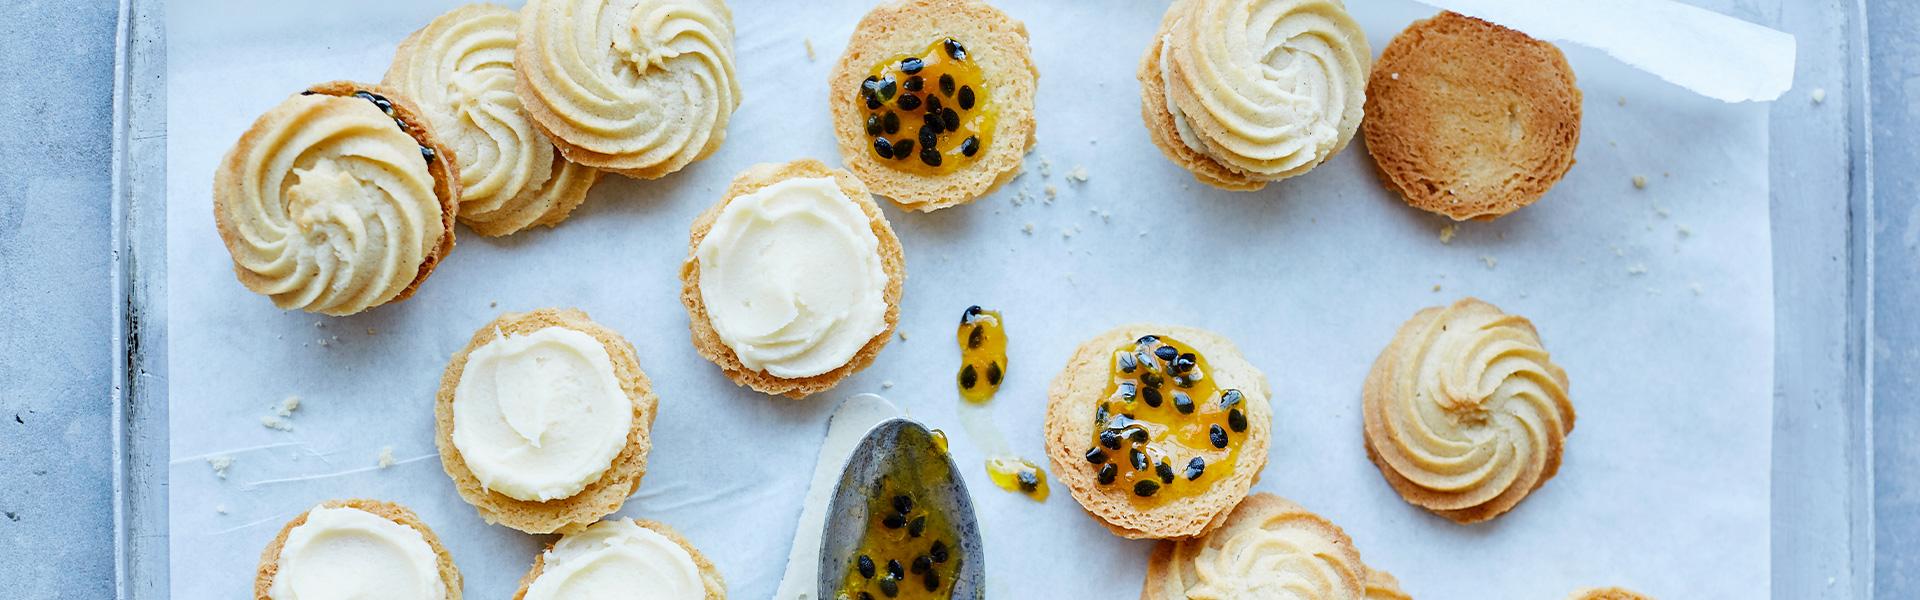 Martha Collison: Passionfruit Viennese Whirls Recipe